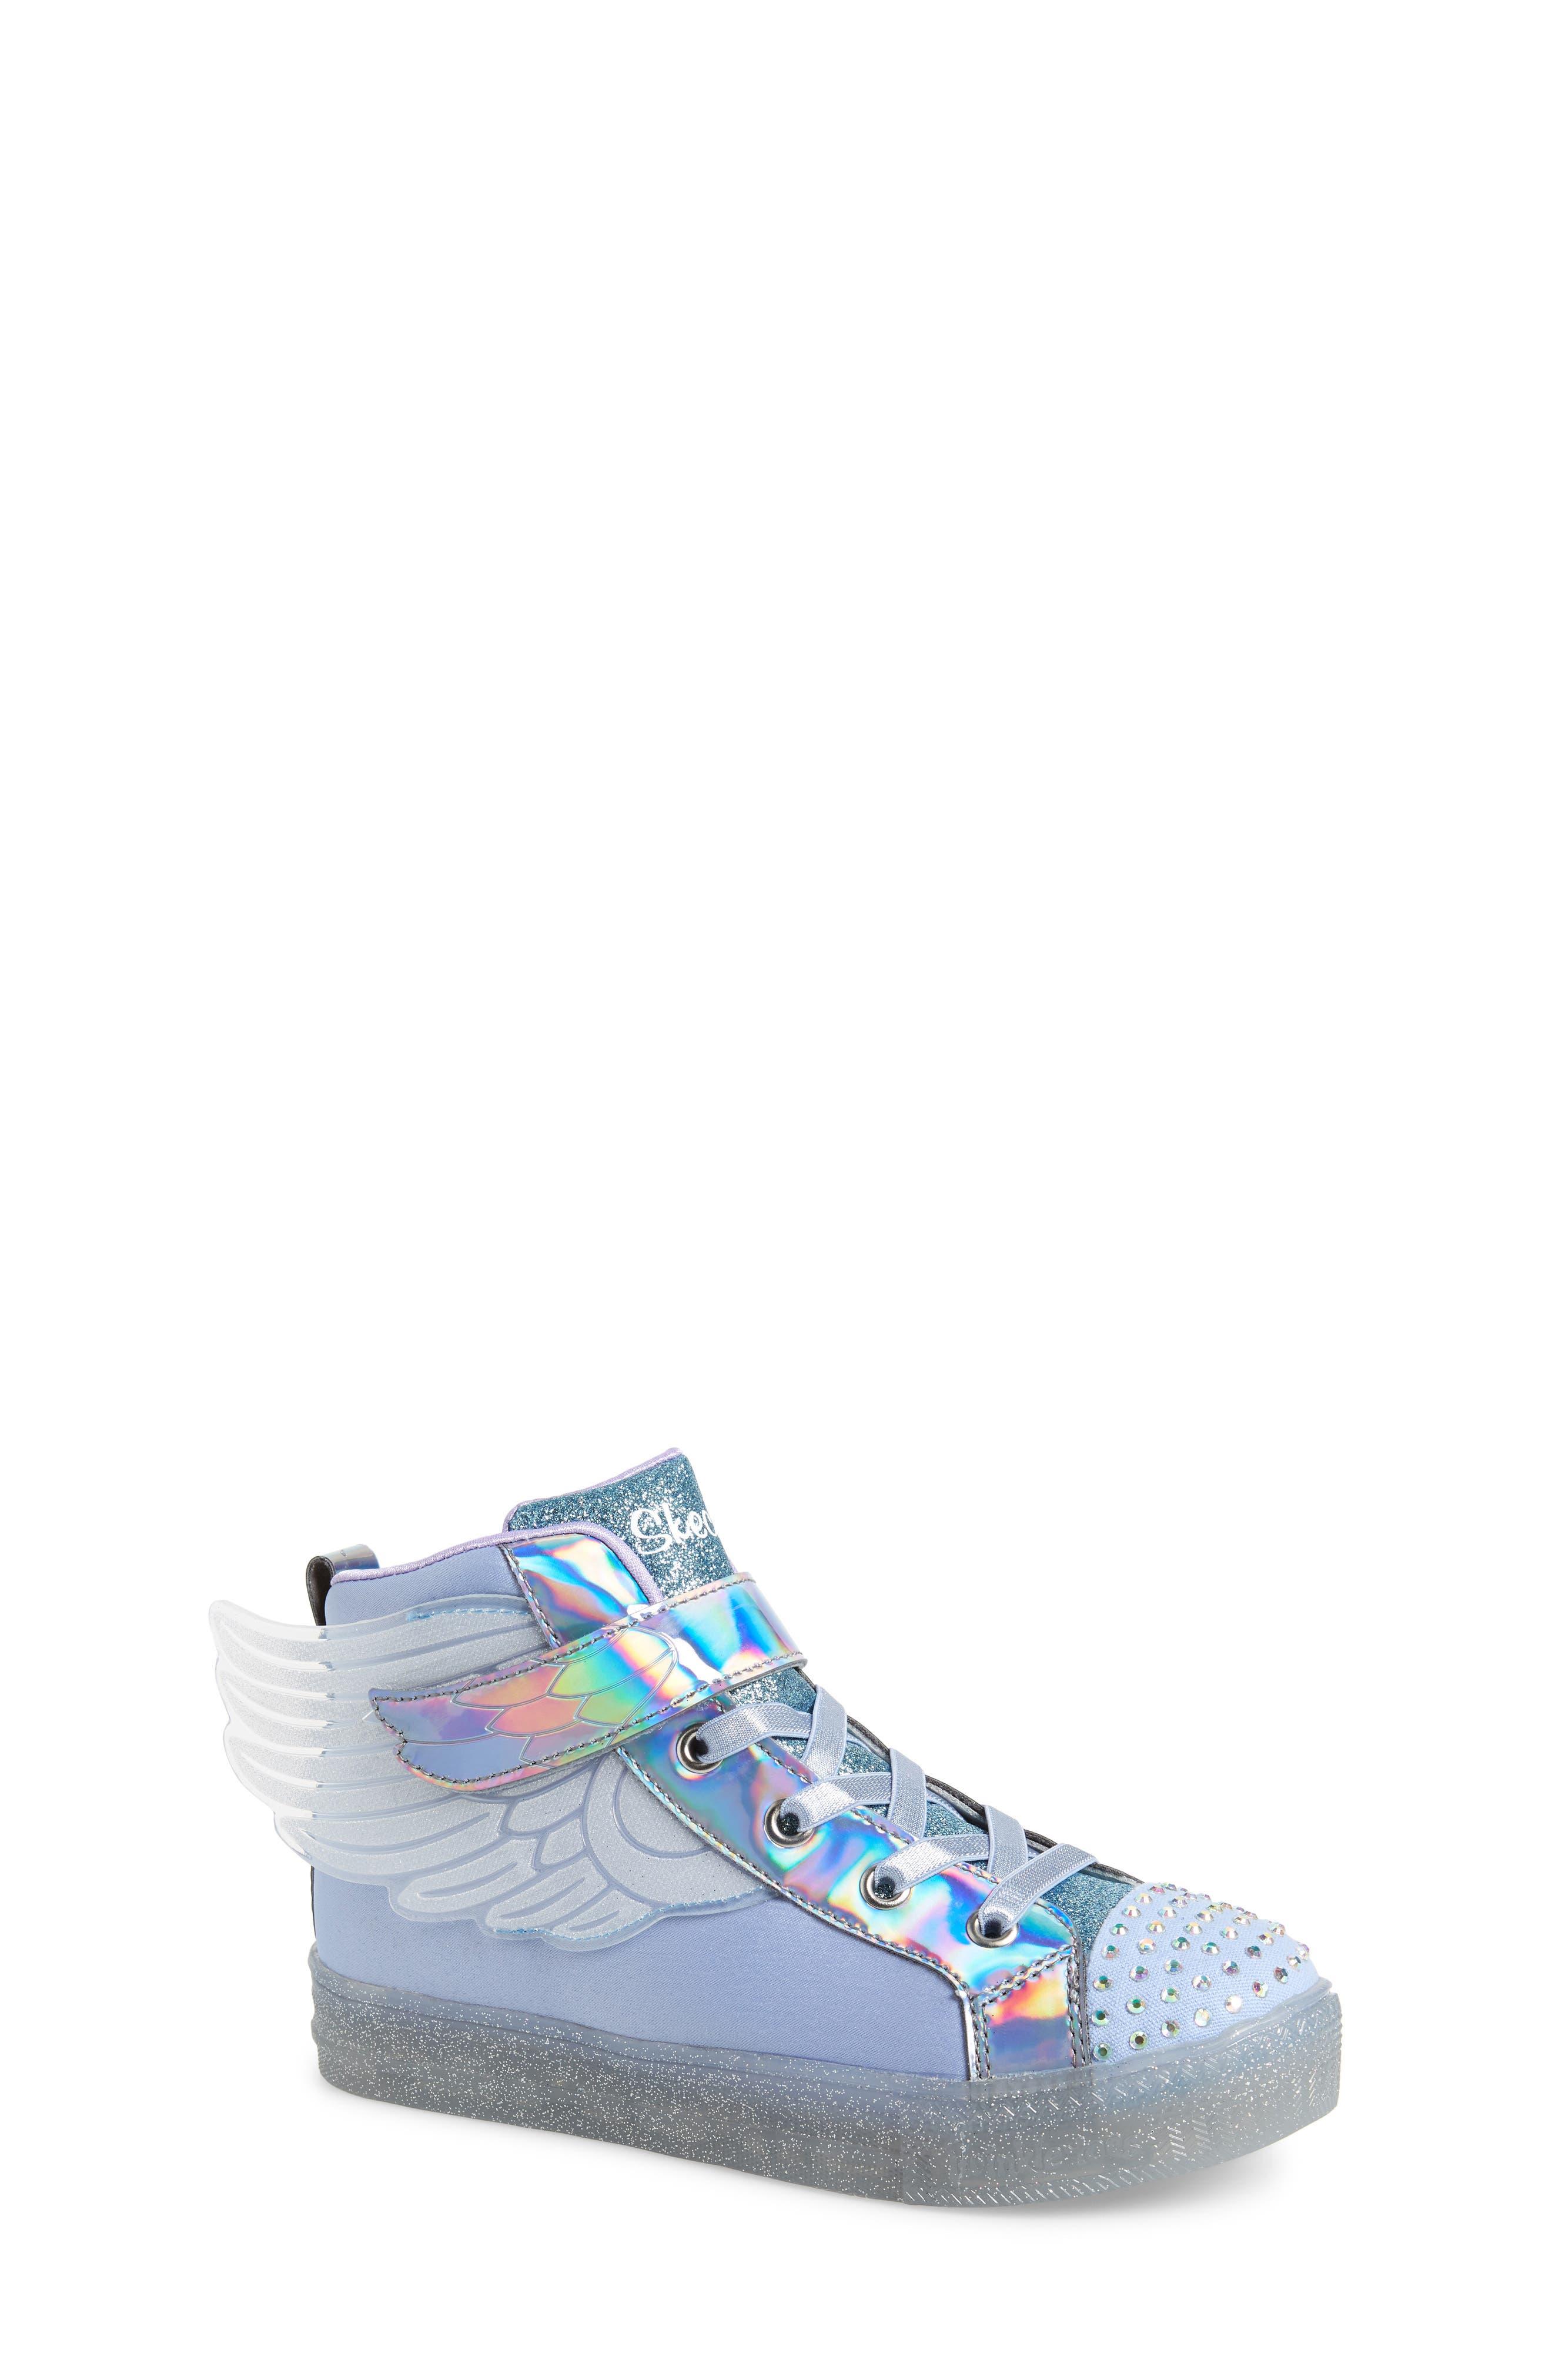 SKECHERS Twinkle Toes Light-Up Sneaker, Main, color, PERIWINKLE